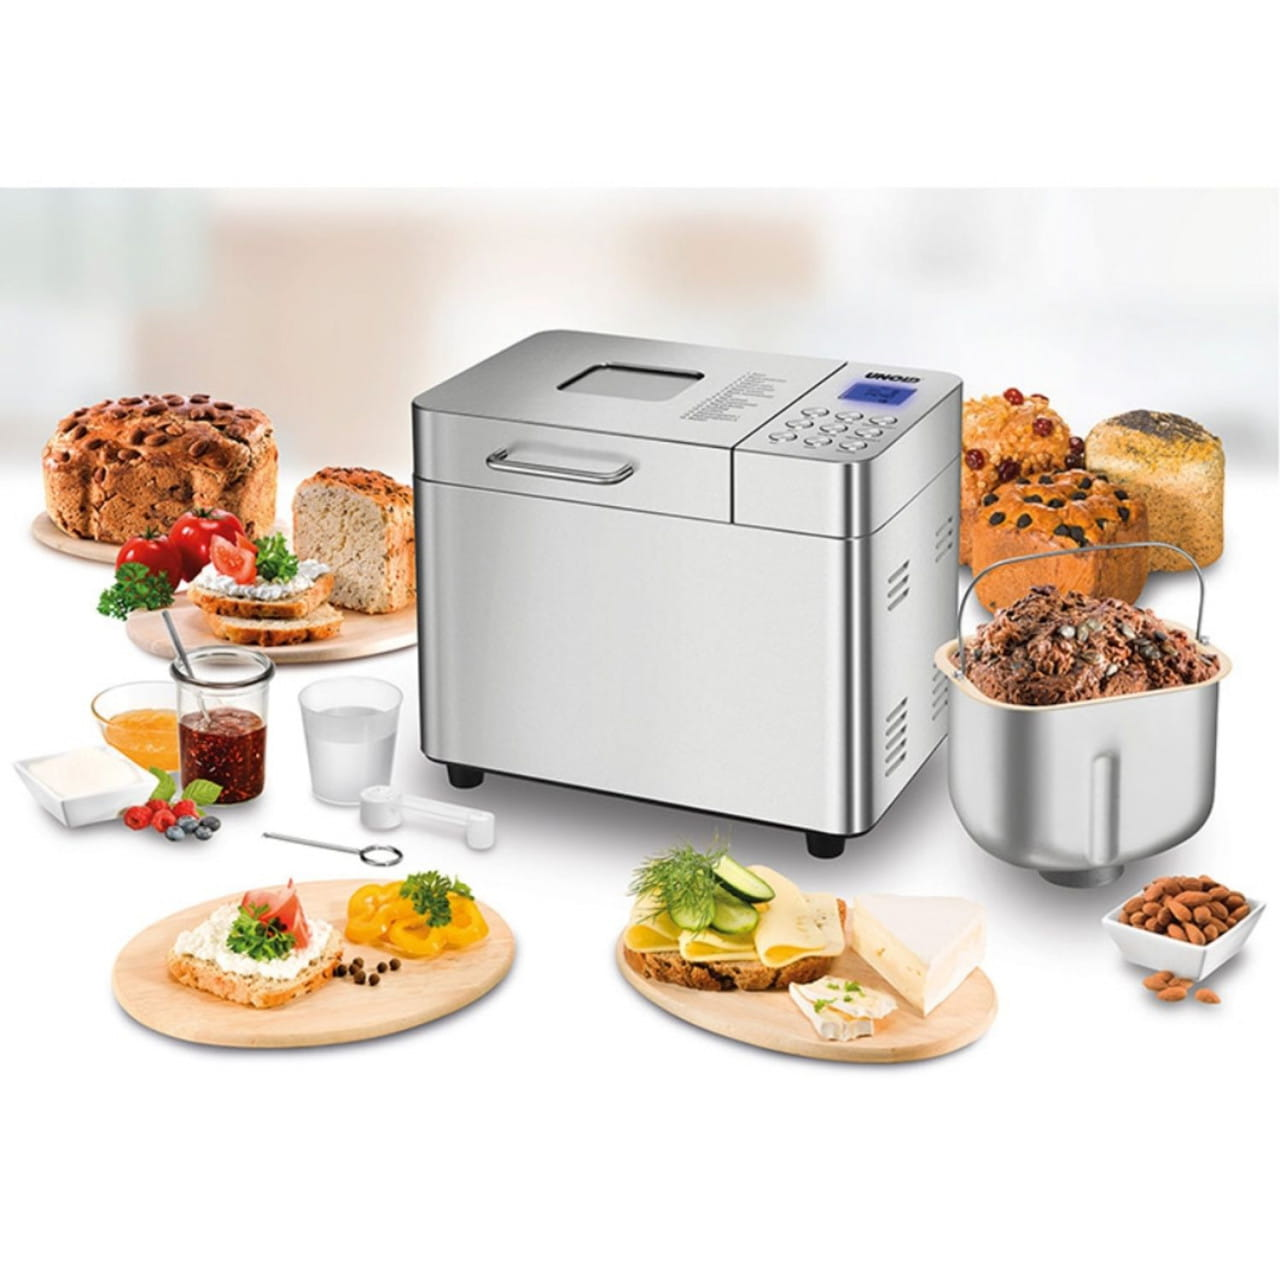 BACKMEISTER Edel (Brotbackautomat, Keramik-Beschichtung, Backofen, Edelstahlg...